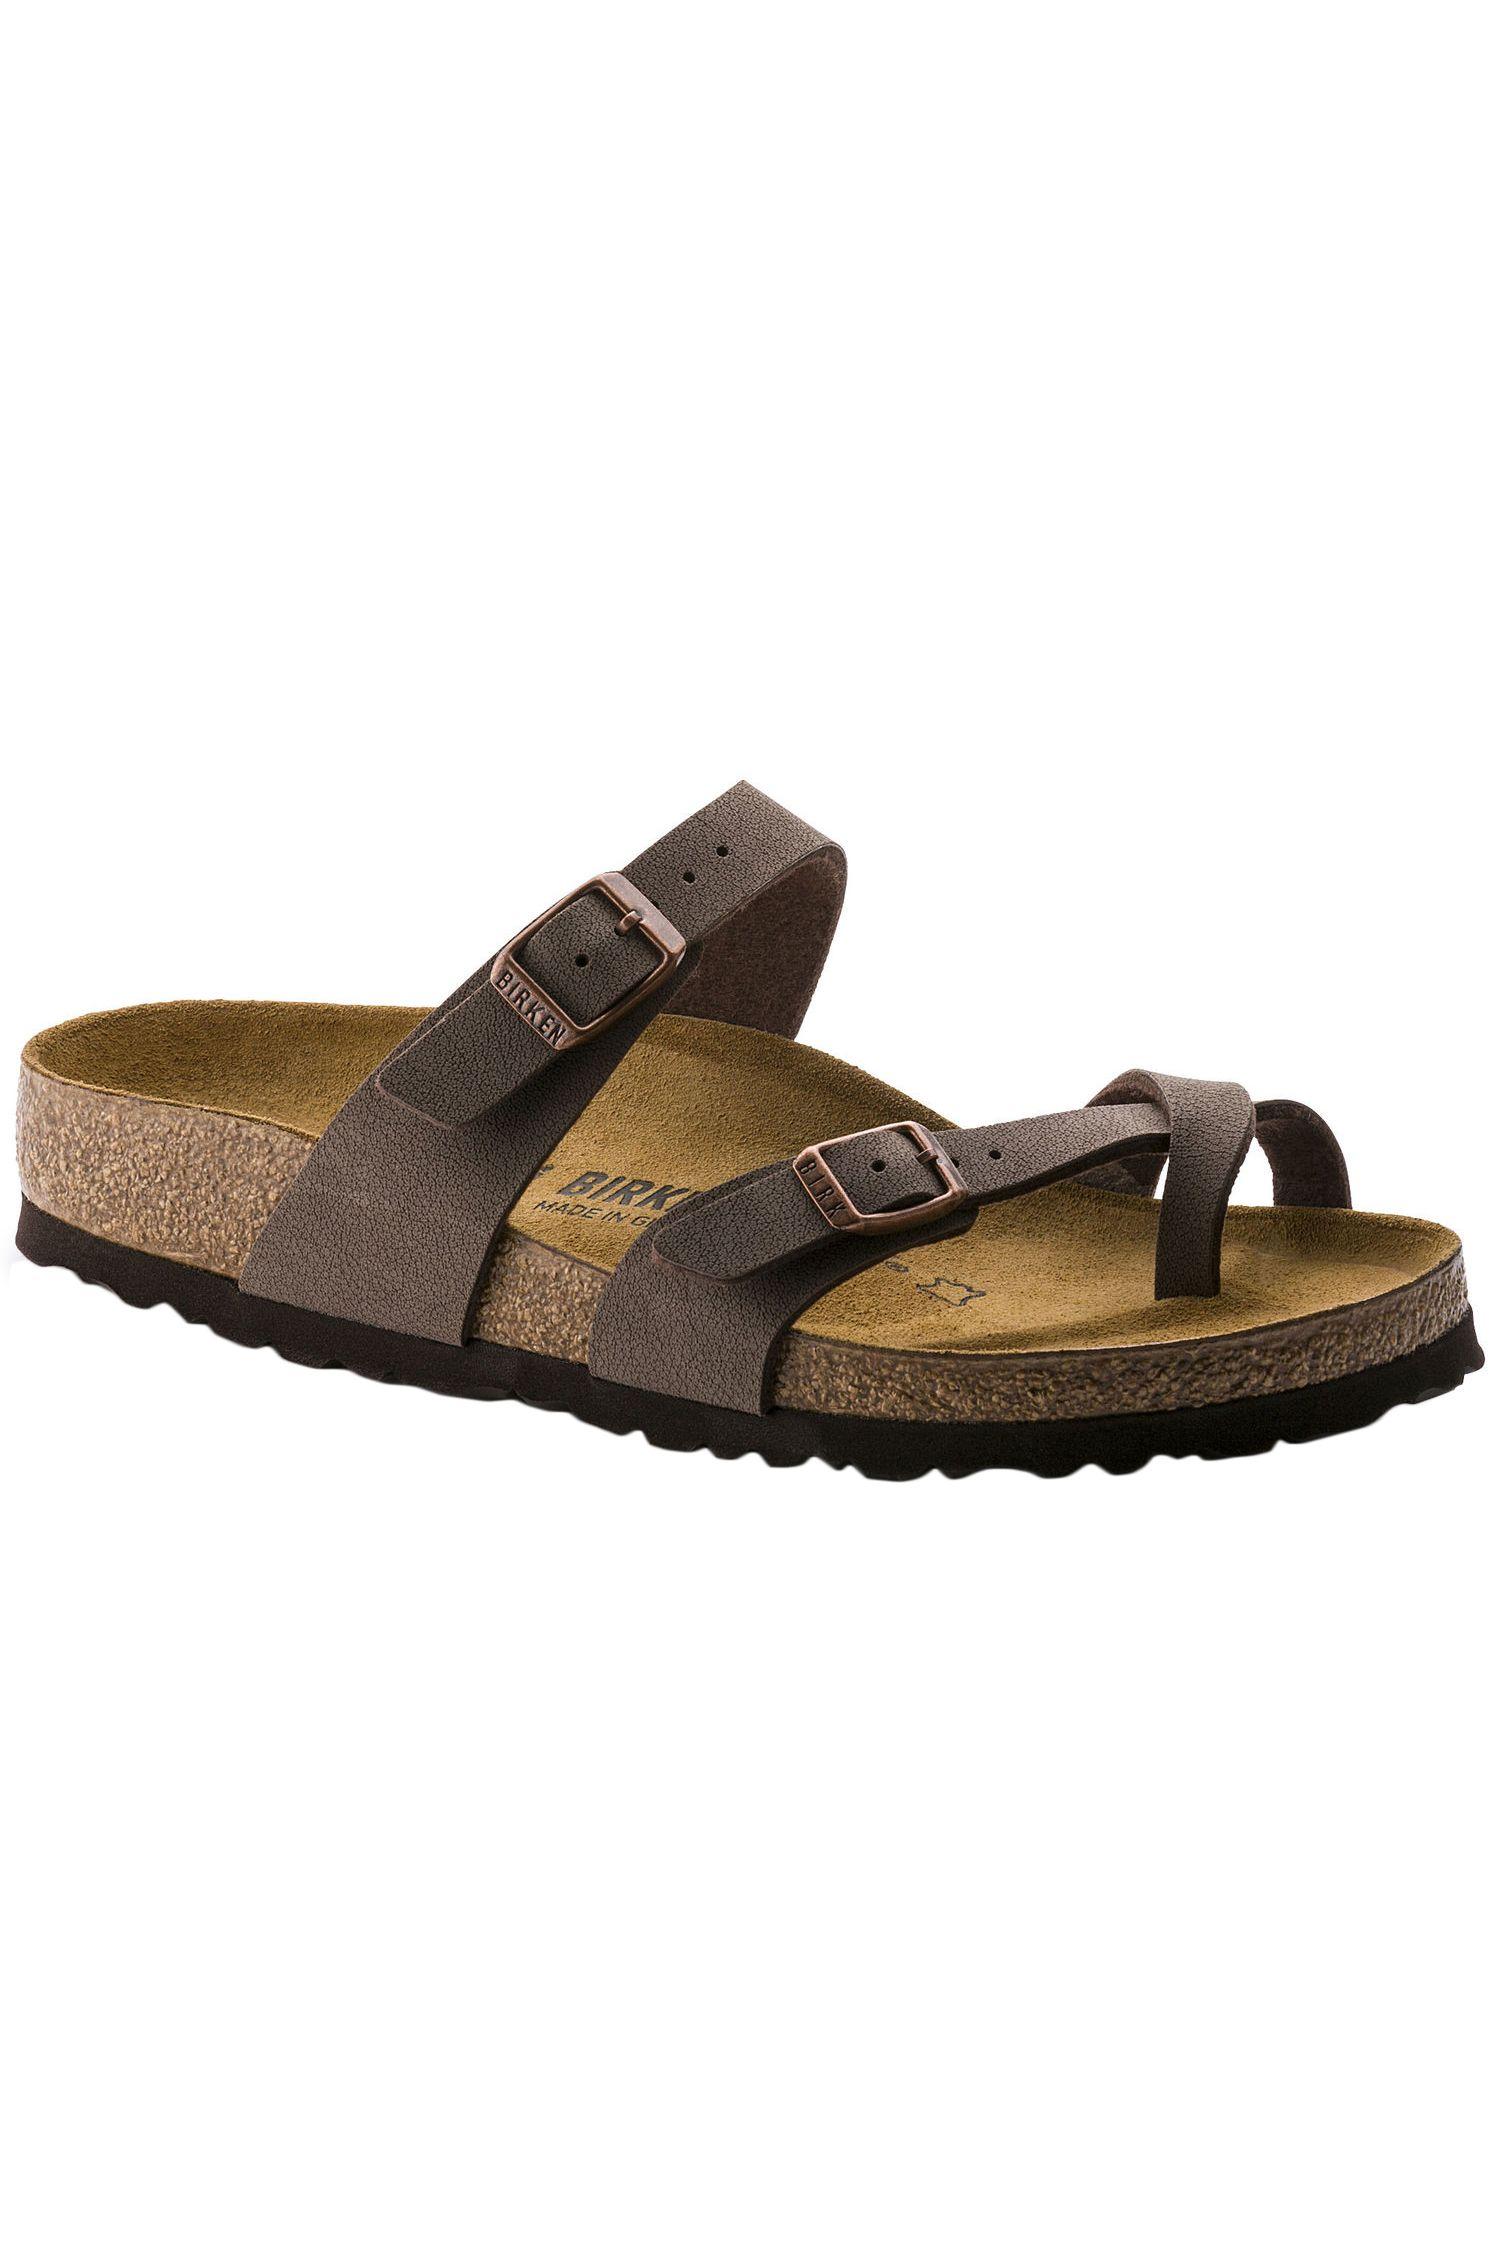 Birkenstock Sandals MAYARI REGULAR Mocca